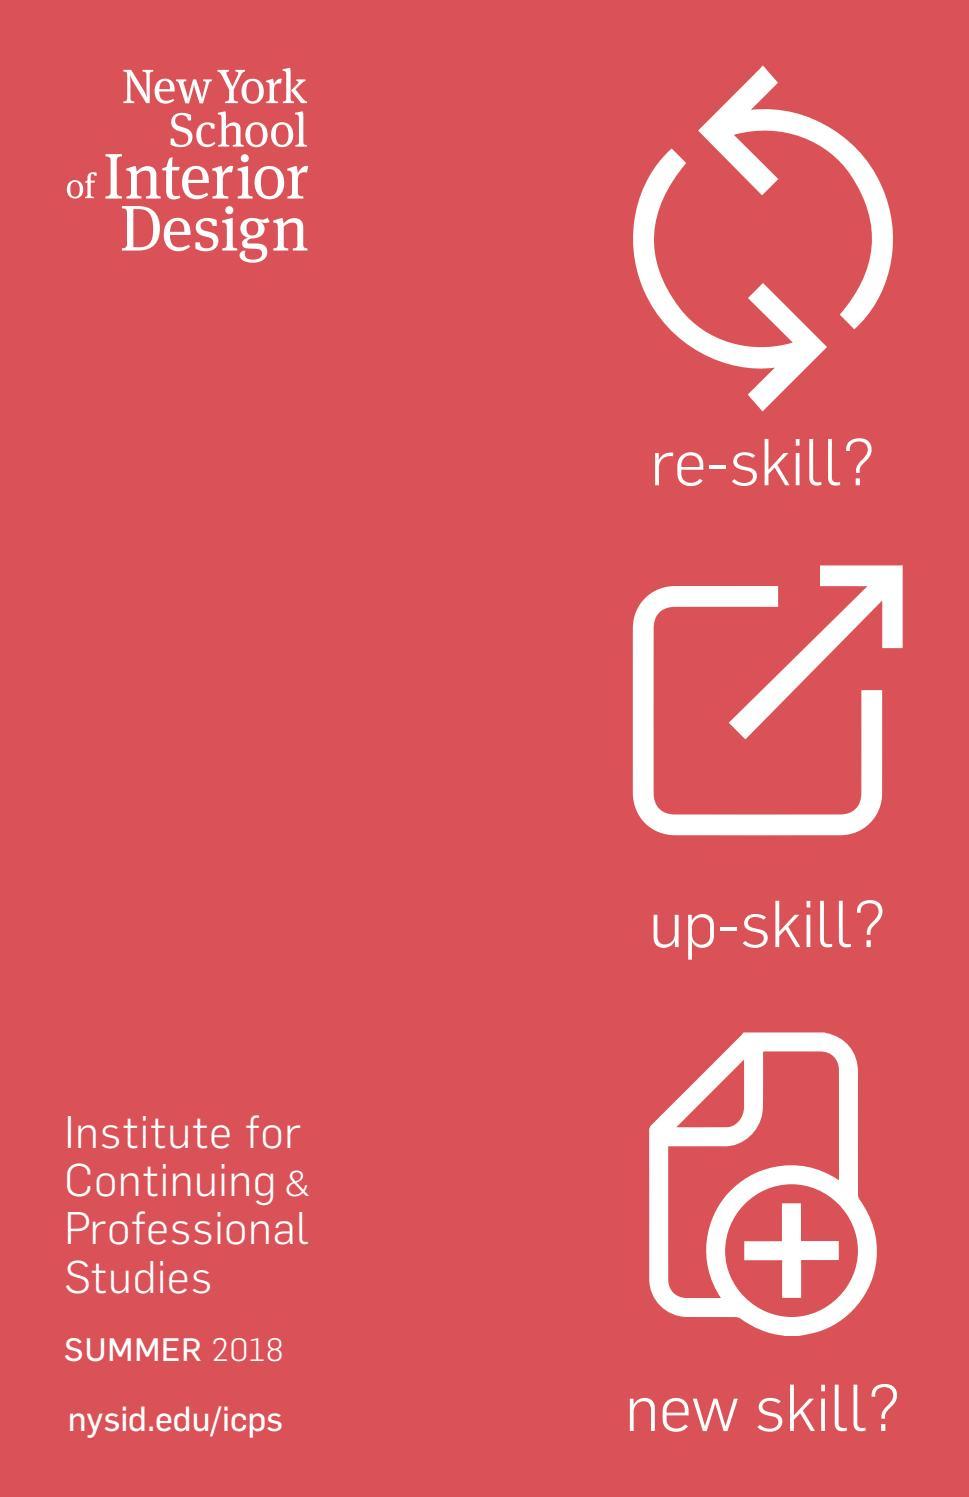 Summer 2018 Institute for Continuing & Professional ...